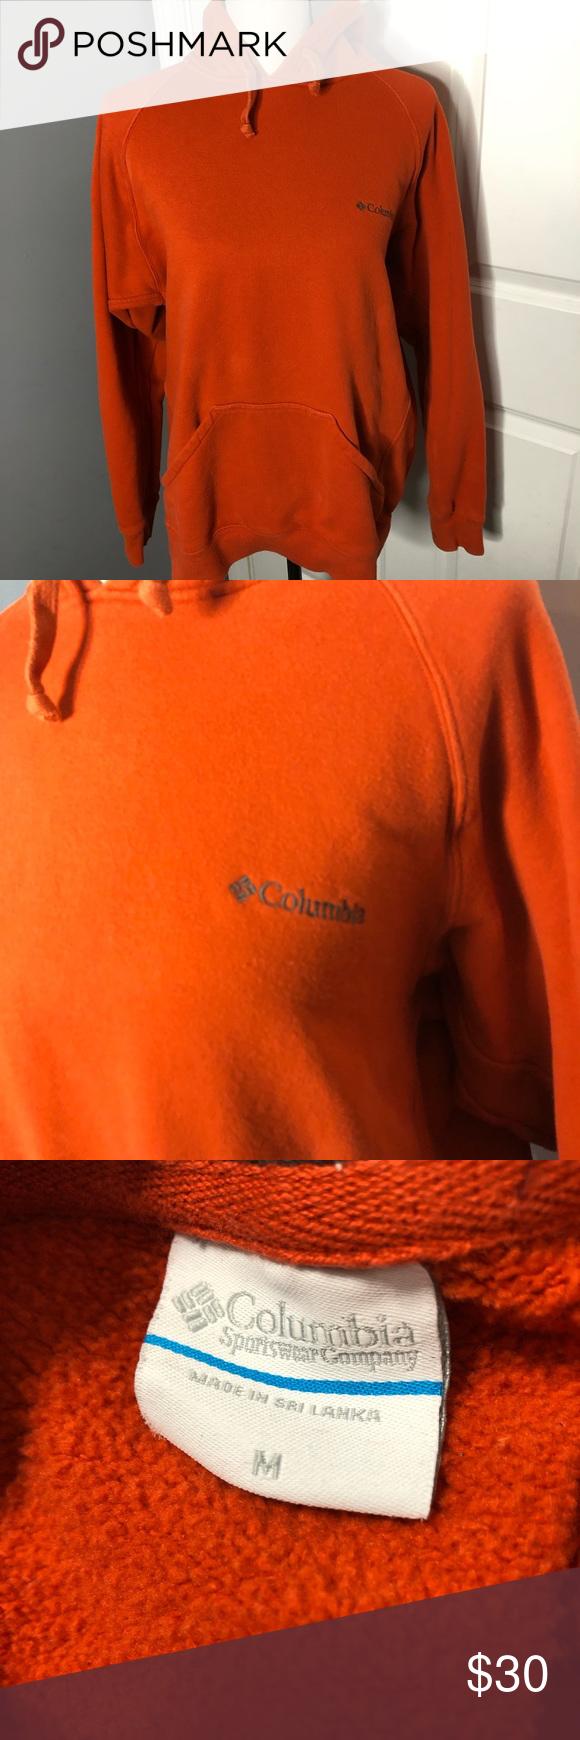 Columbia Men S Burnt Orange Hoodie Columbia Hoodie Orange Hoodie Columbia Shirt [ 1740 x 580 Pixel ]